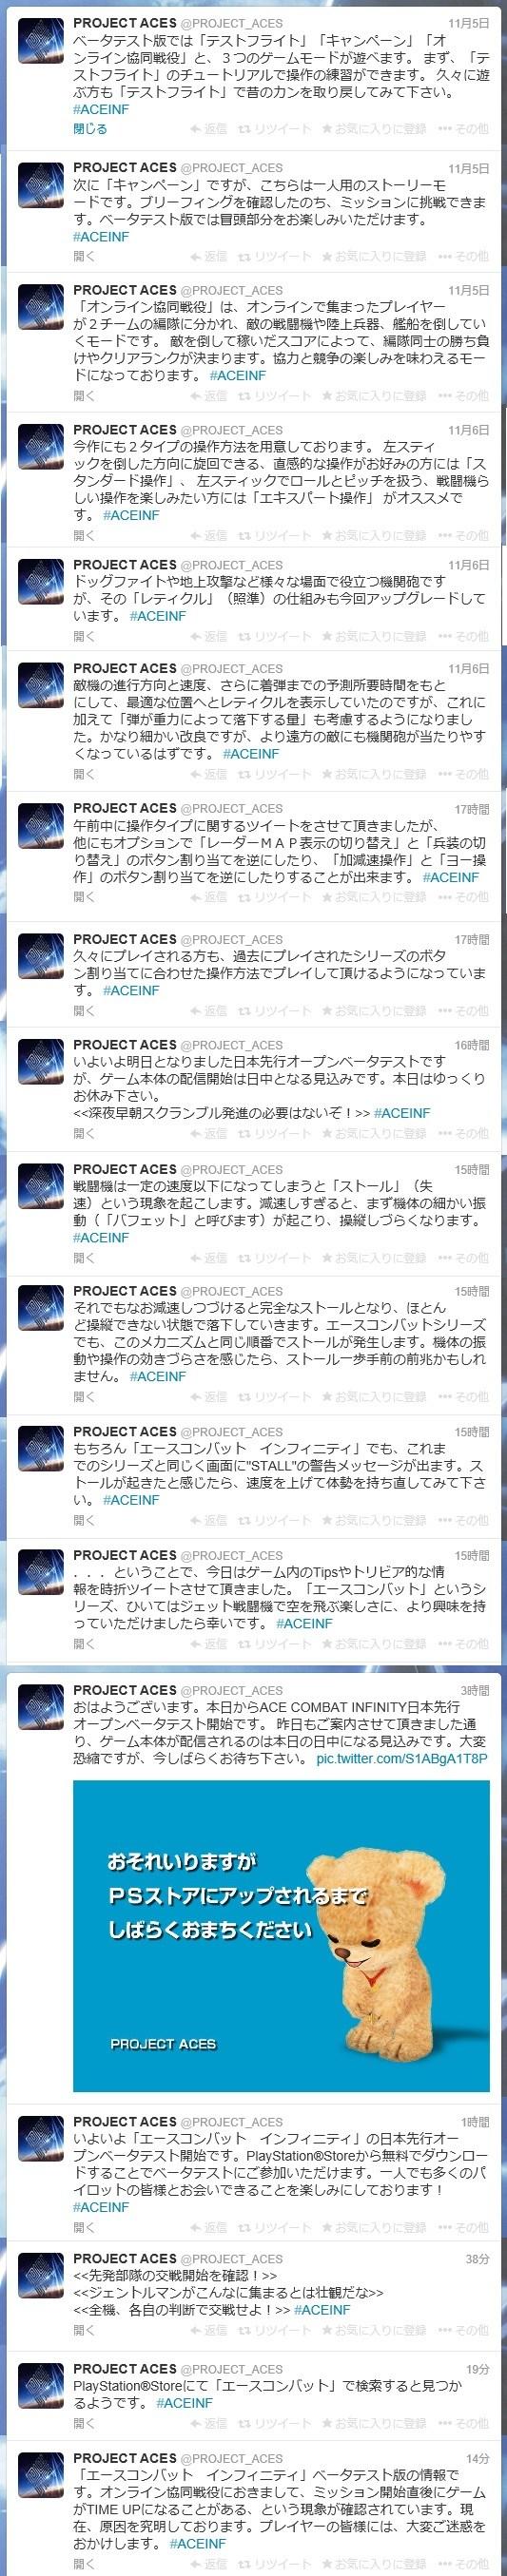 aceif-beta131107-twitter2.jpg